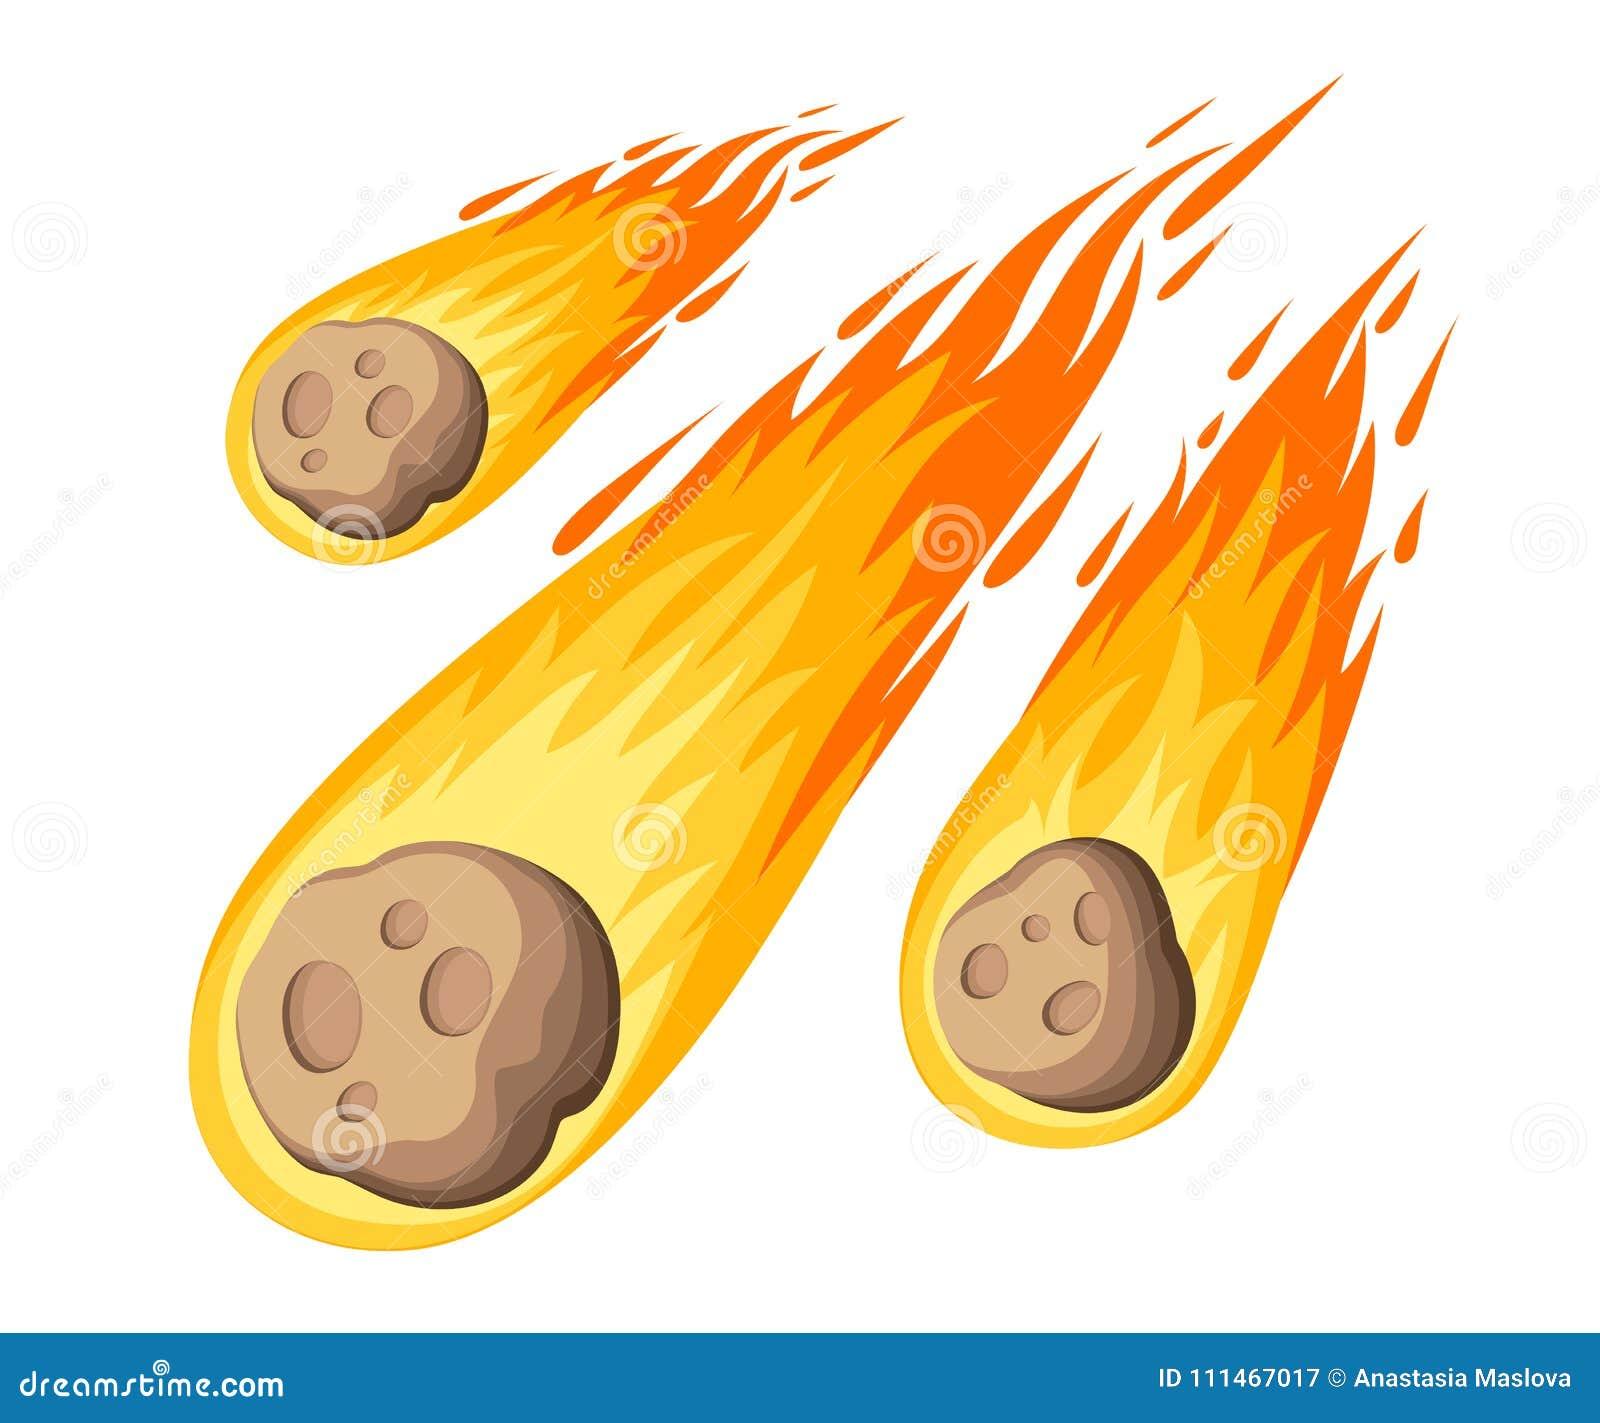 Метеорит пламени Падение дождя метеора на планету в стиле шаржа Значок цвета катаклизма Иллюстрация вектора изолированная на бело